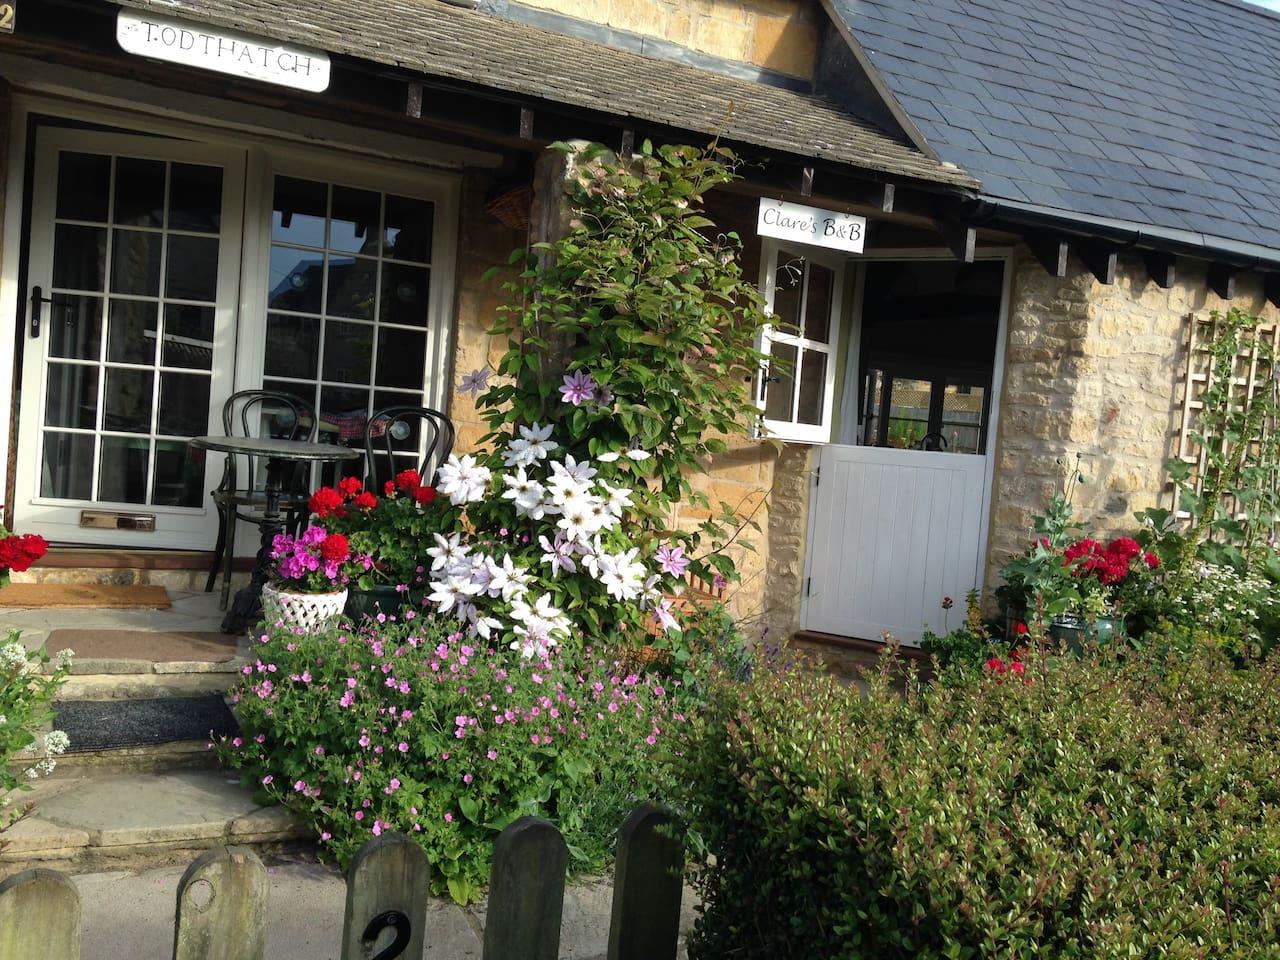 Todthatch cottage